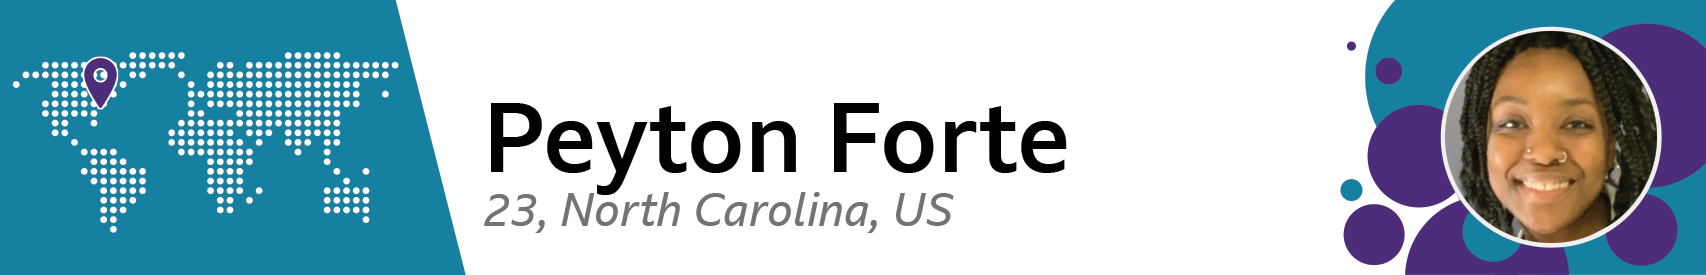 Peyton Forte